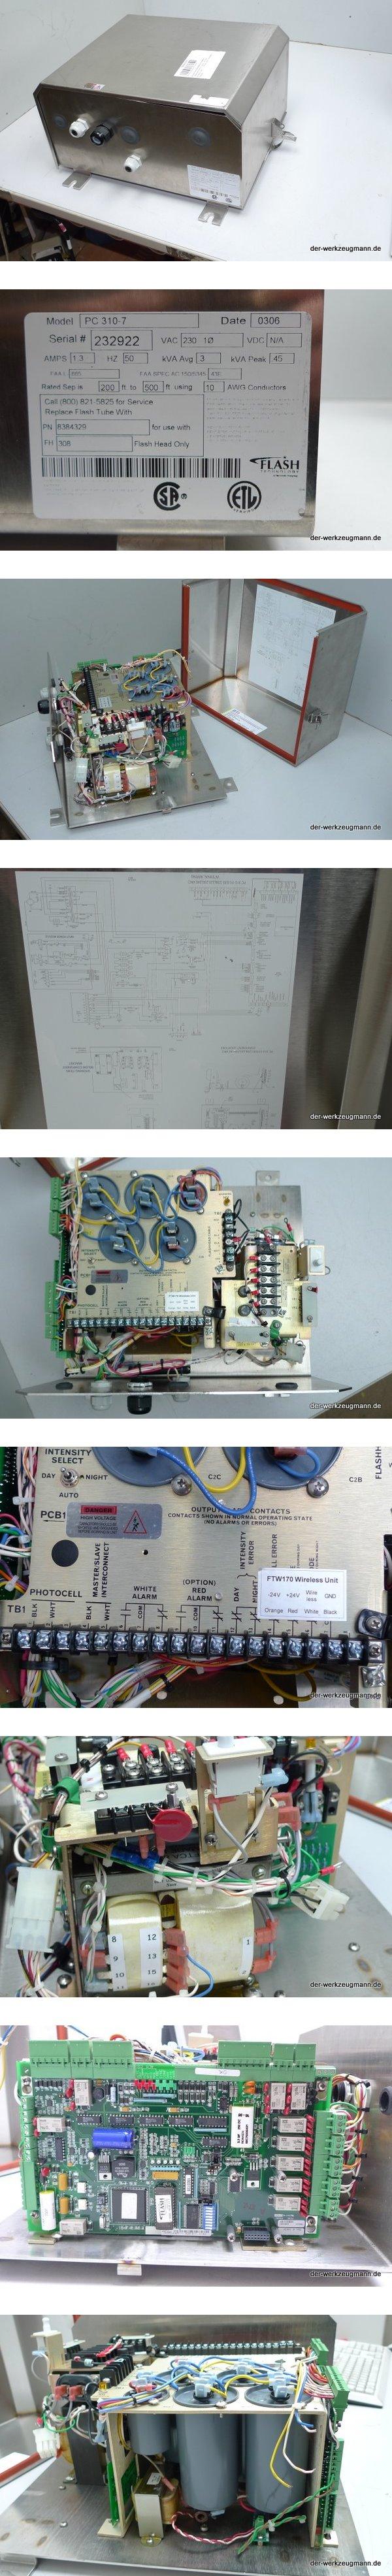 Flash FTW170 Medium Intensity Obstruction Lighting PC 310-7